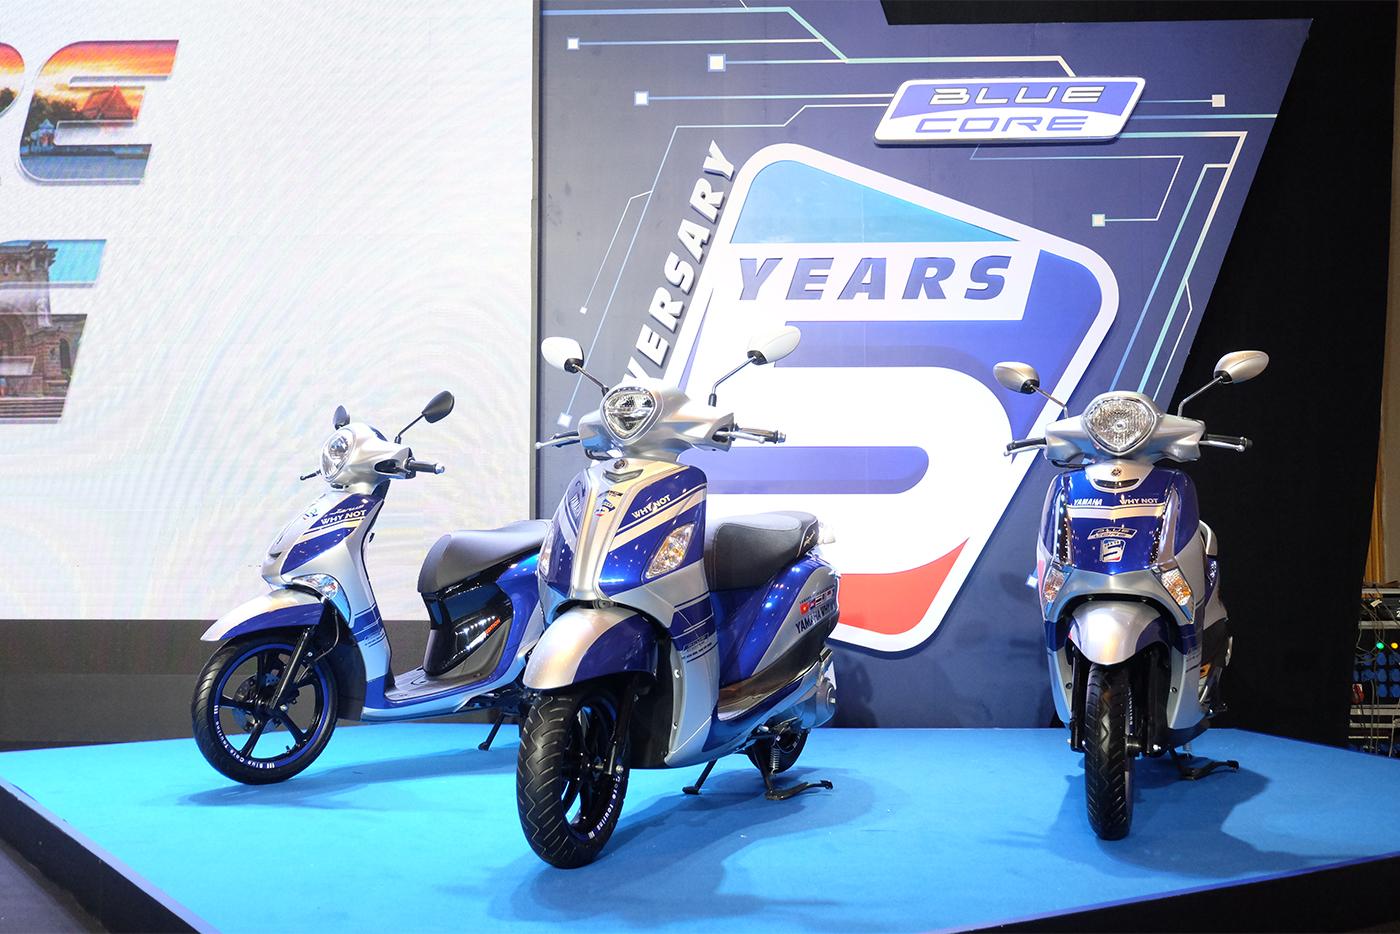 yamaha-motor-viet-nam-ky-niem-5-nam-dong-co-blue-core-va-hanh-trinh-asean-blue-core-touring-5.JPG